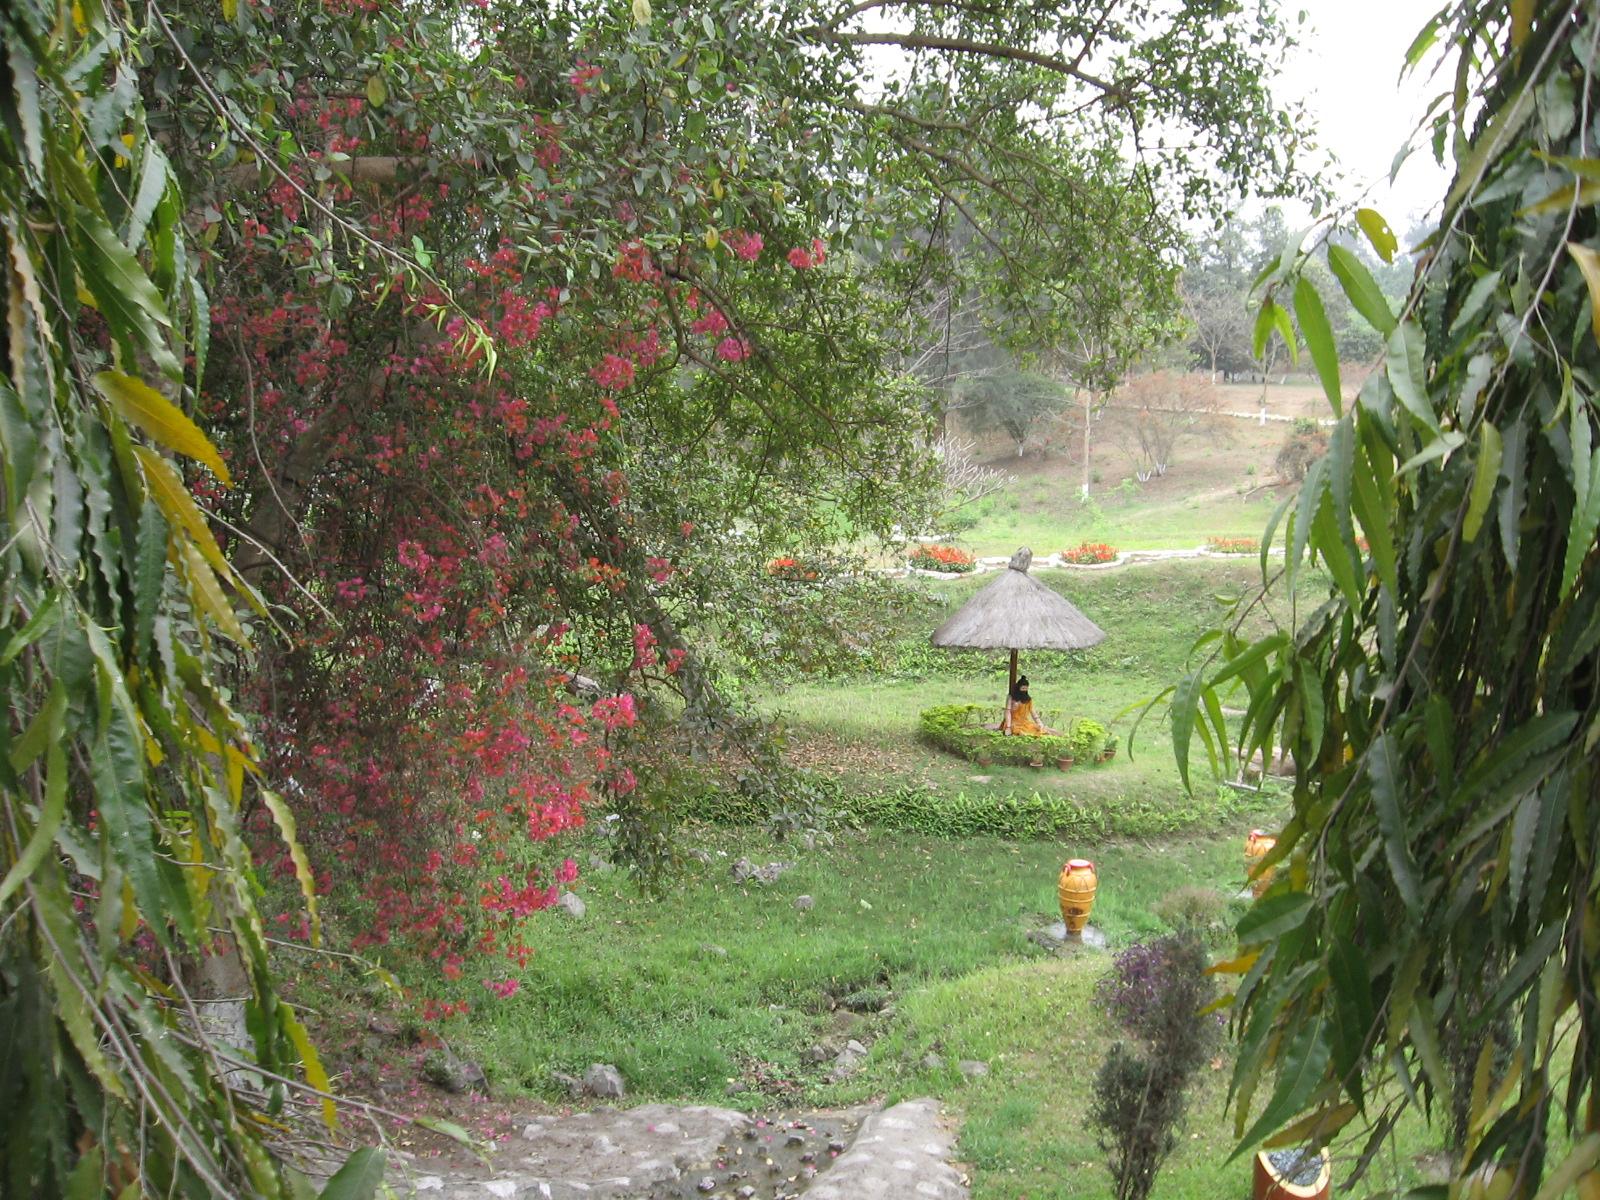 Satabdi Park